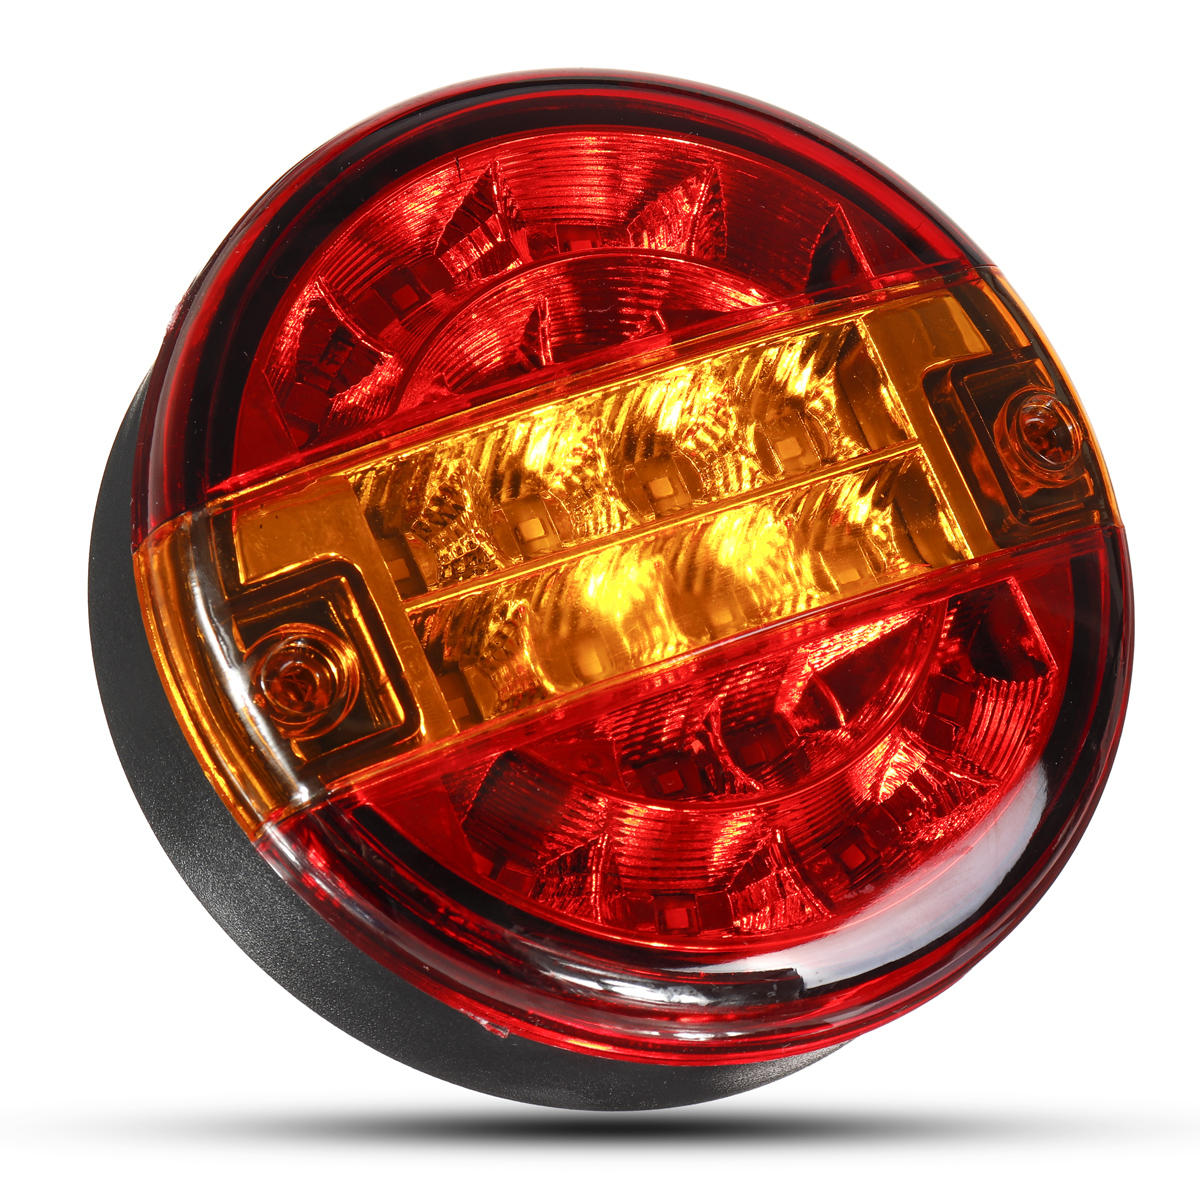 12V 24V Car Rear LED Tail Light Brake Stop Turn Signal Lamp Round Hamburger For Lorry Truck Car Van Trailer